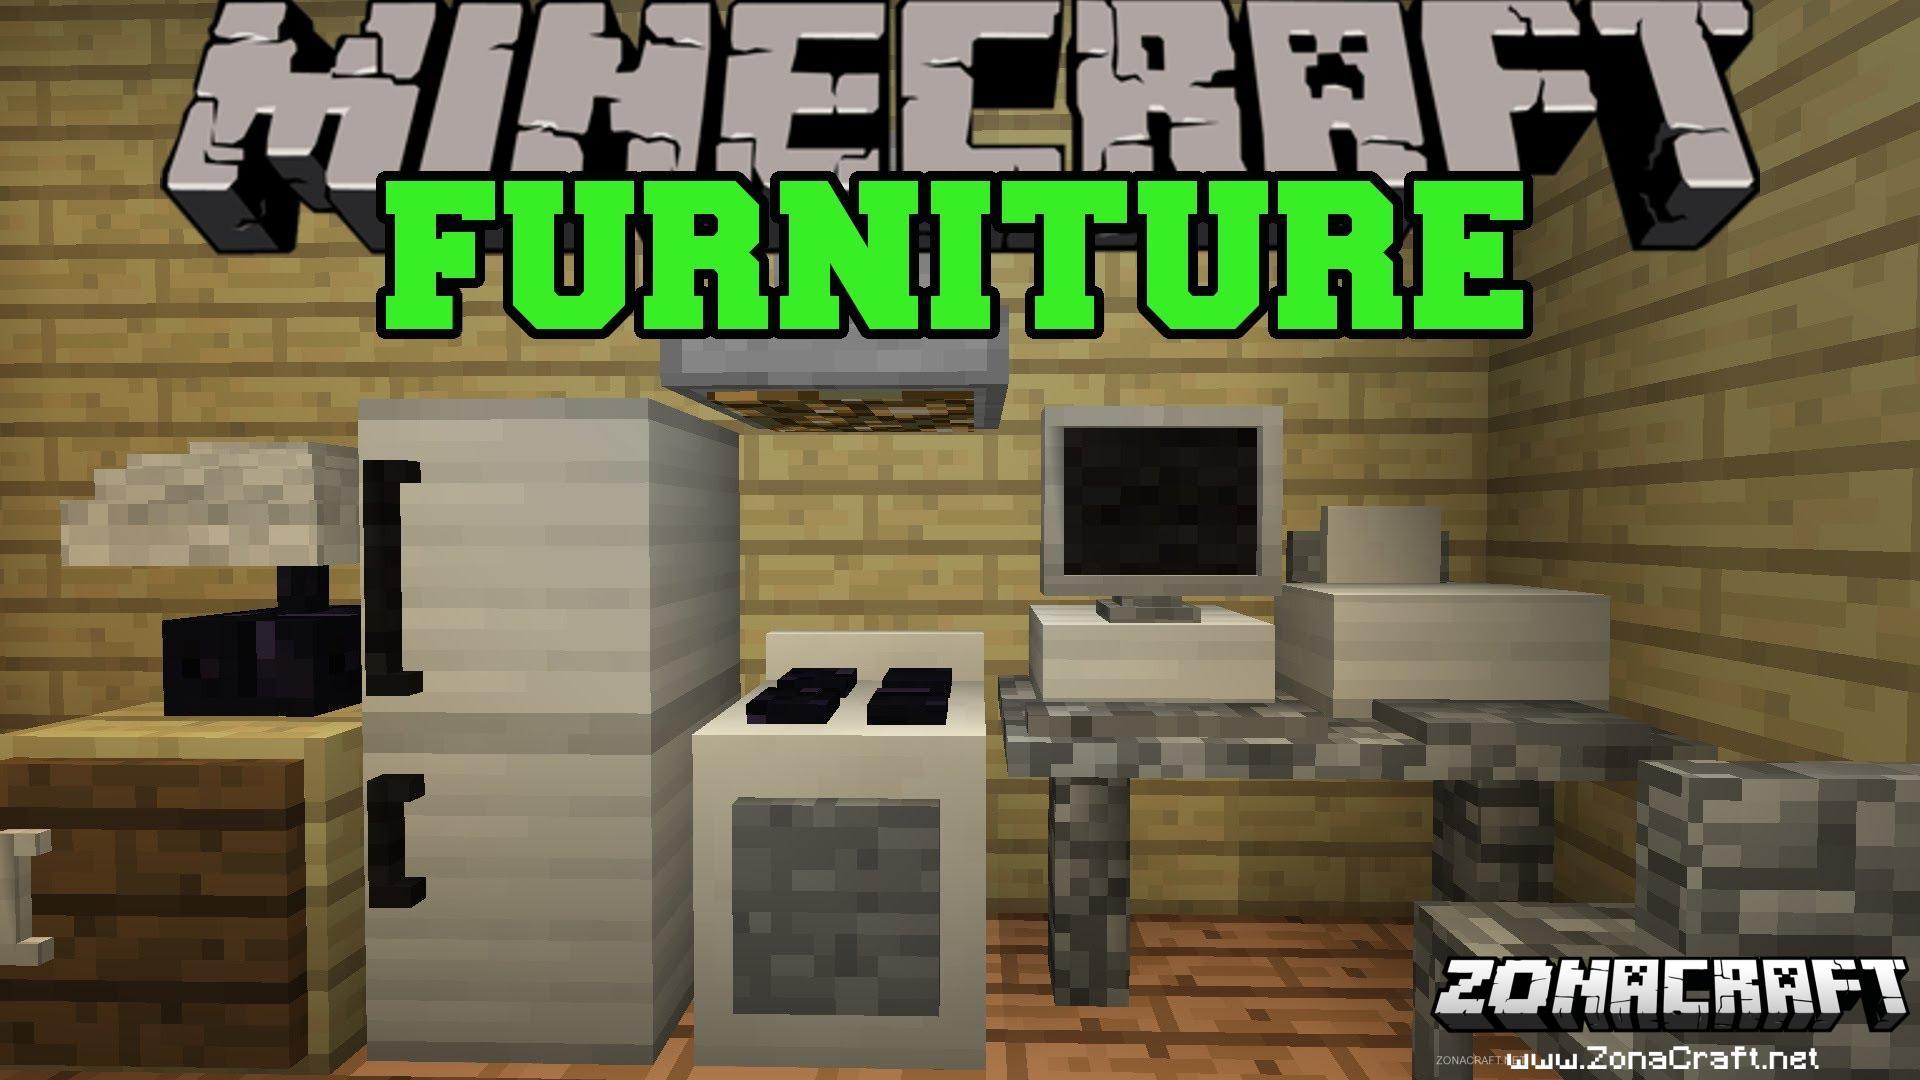 Furniture Mod Para Minecraft 1 16 1 1 15 2 1 14 4 1 12 2 1 11 2 1 10 2 1 9 4 1 8 9 1 7 10 Zonacraft